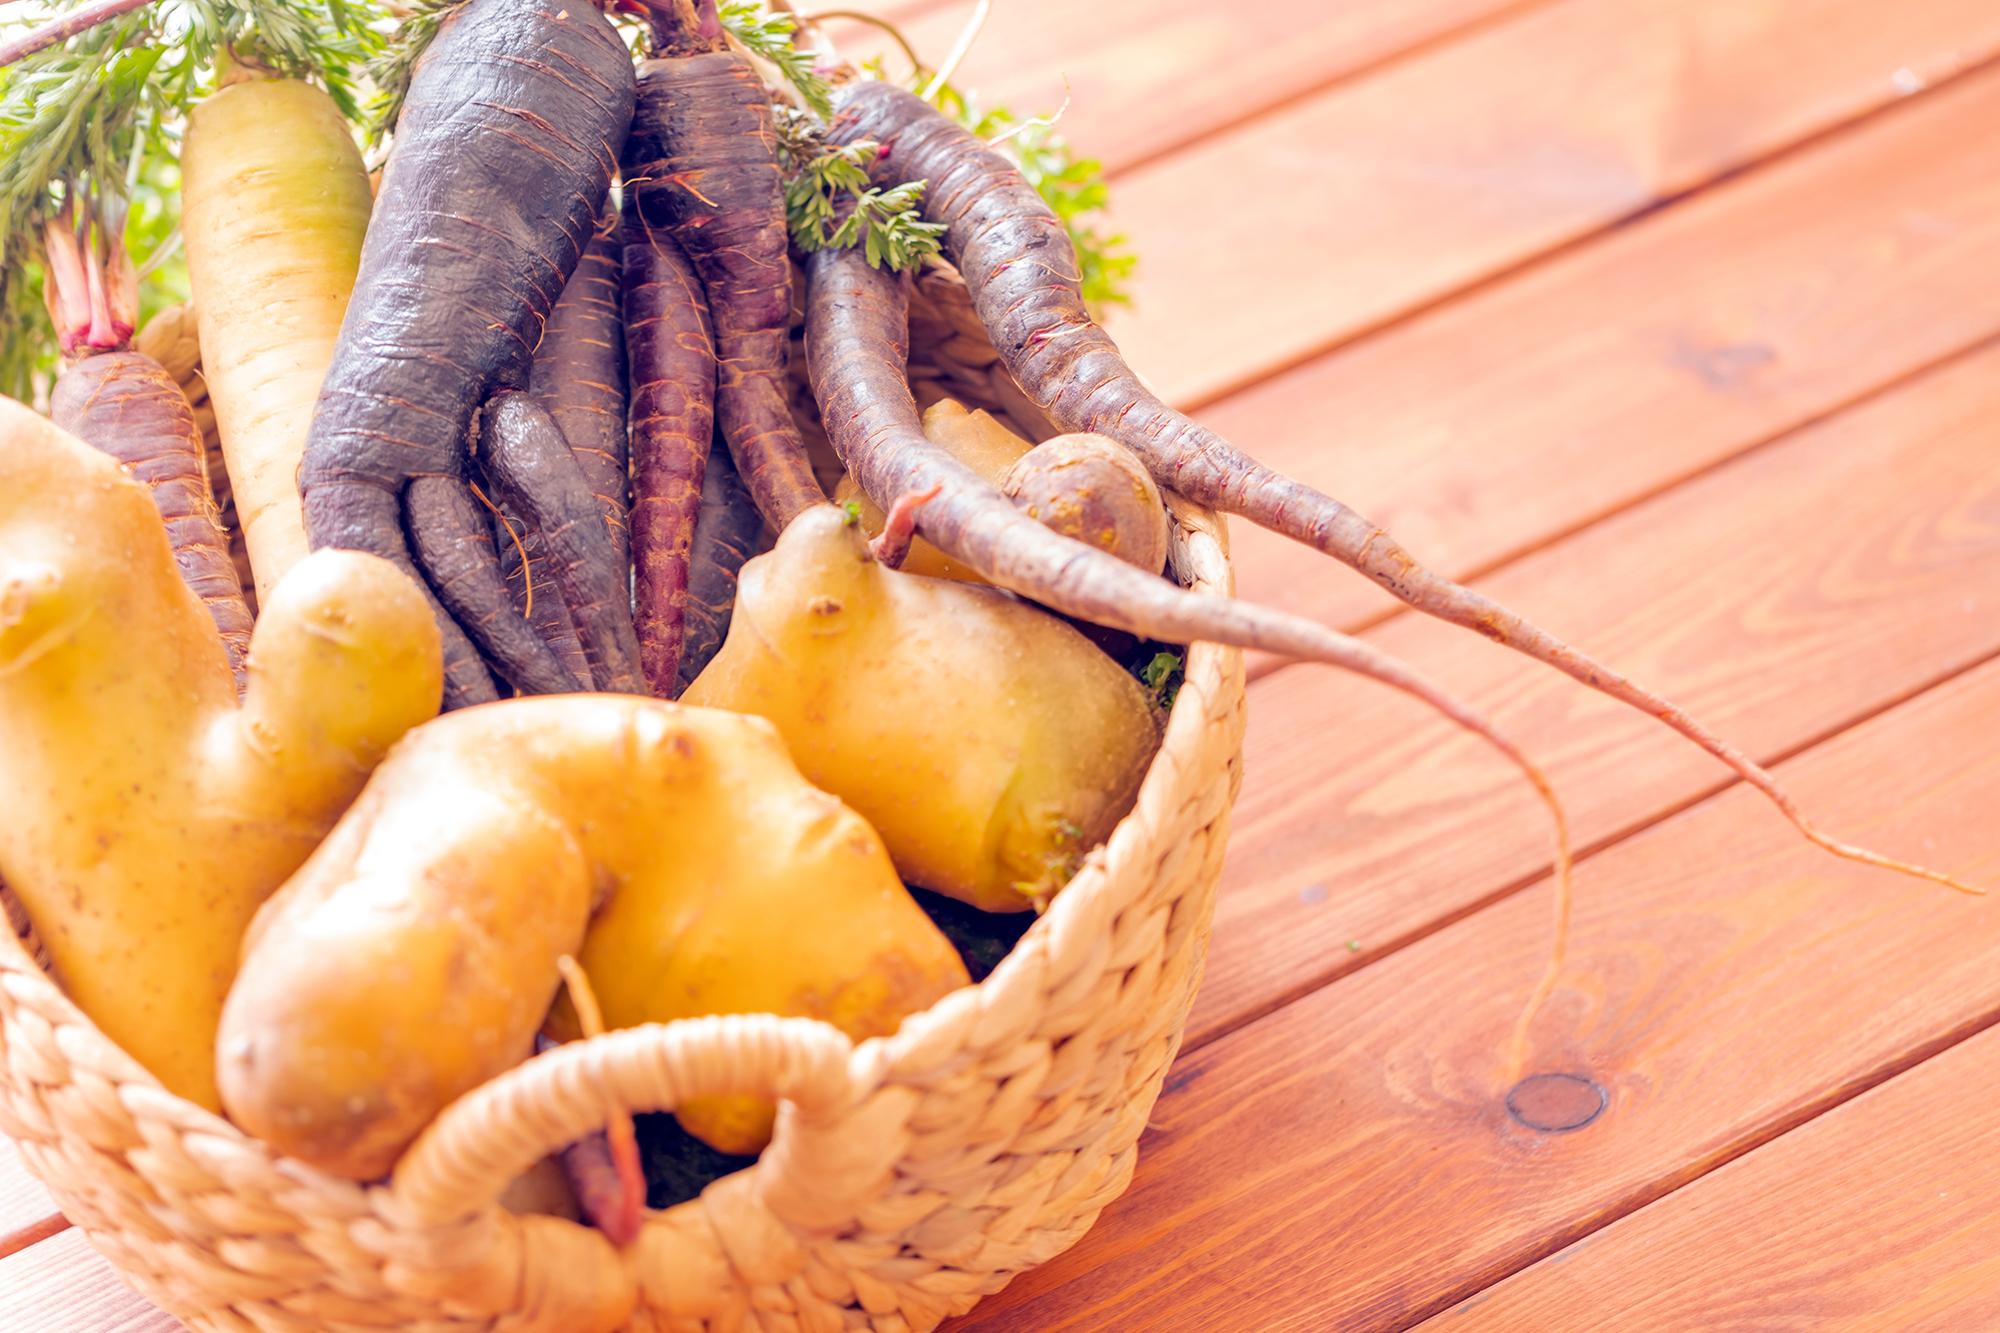 Wonky veg. (Image: Shutterstock)